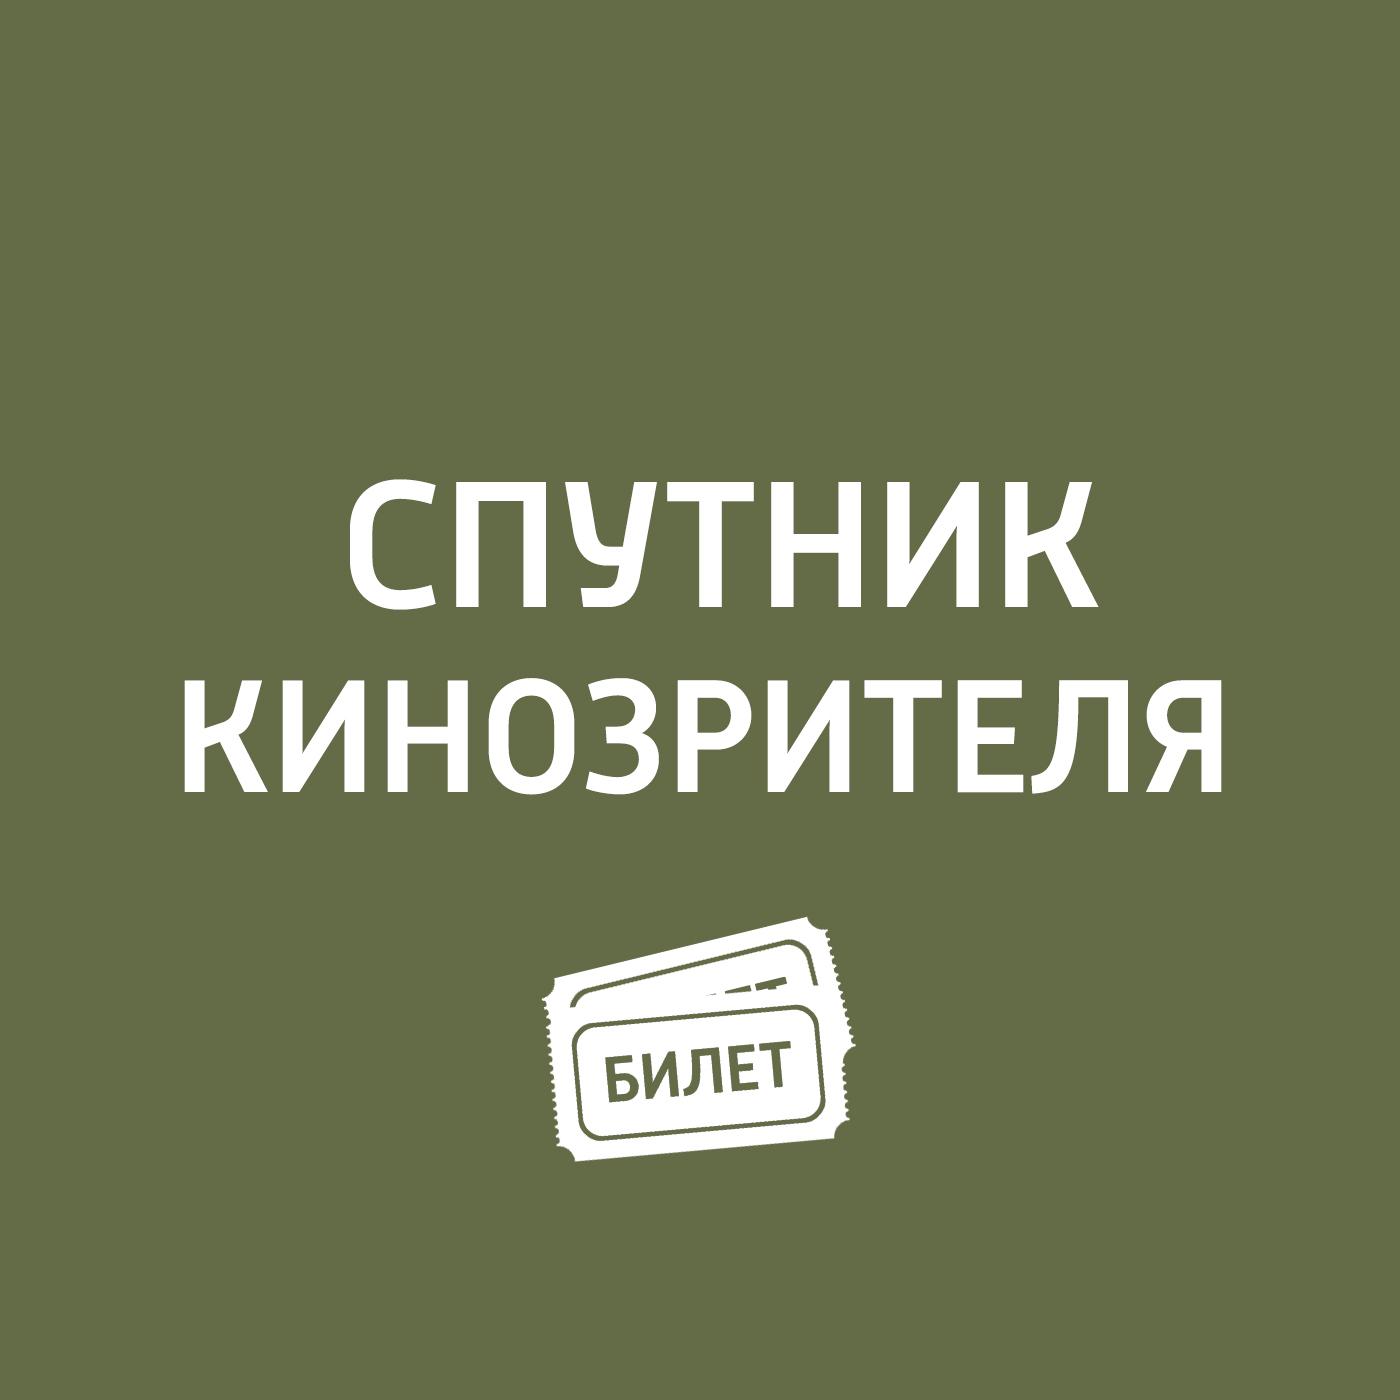 Антон Долин Мачо и ботан 2, «Теорема Зеро антон долин киносказки вчера и сегодня